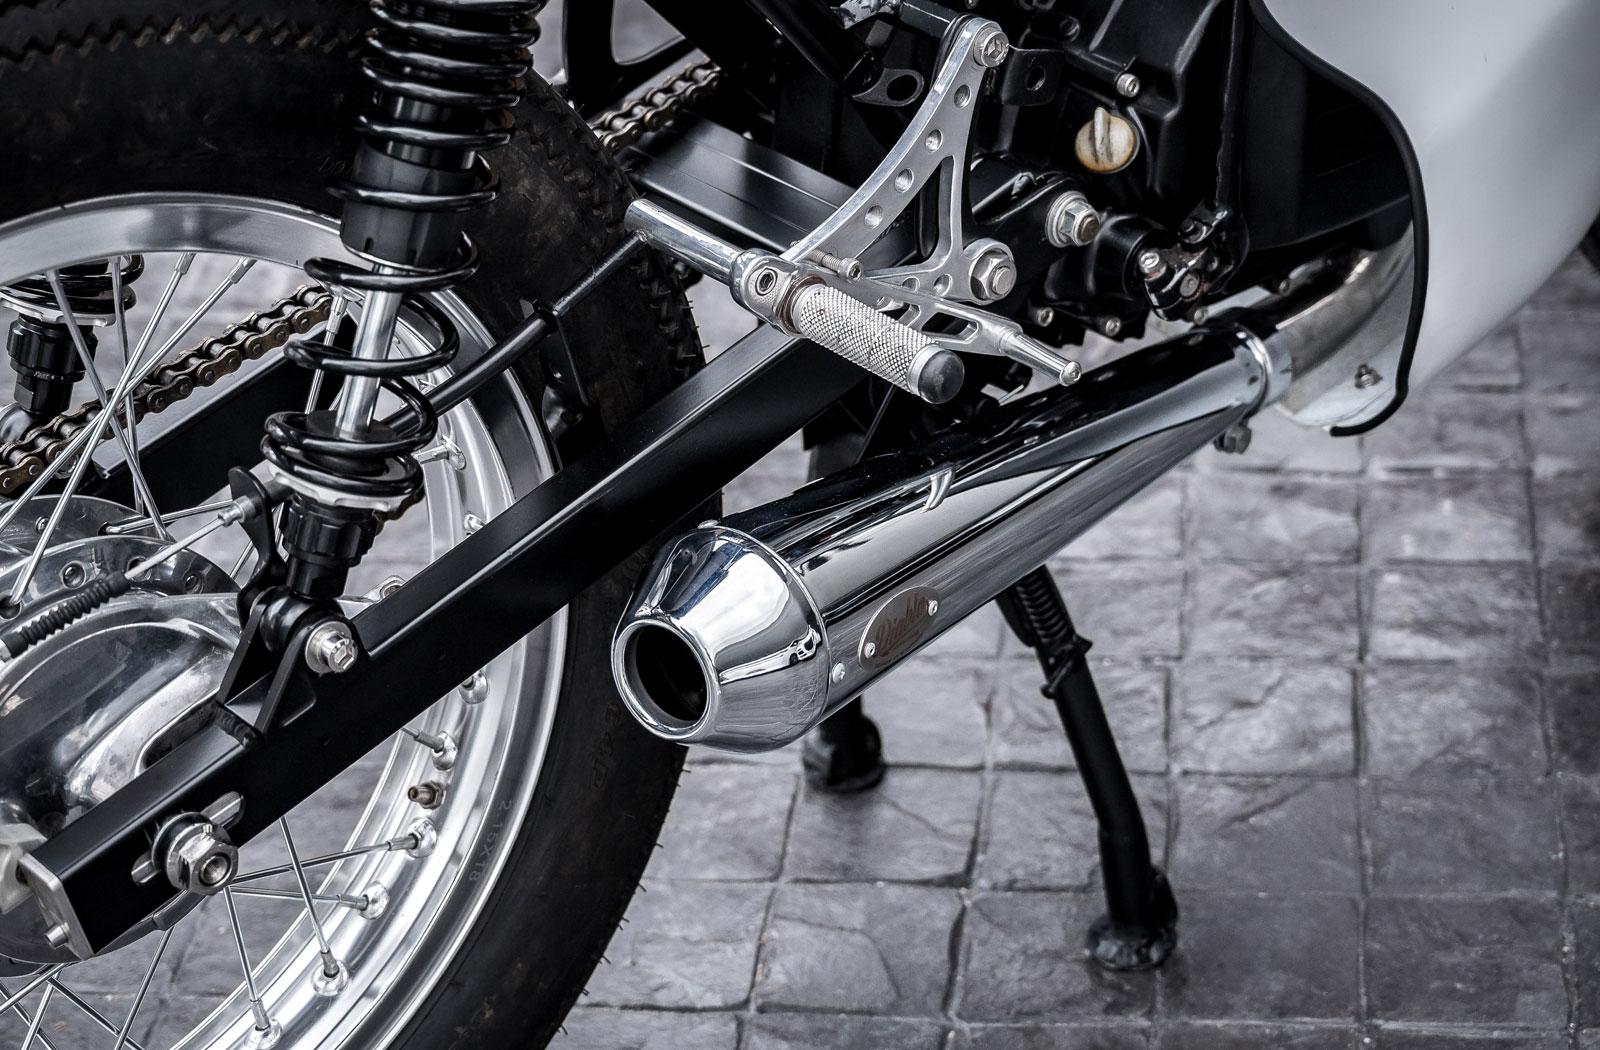 Honda 125 Megaphone exhaust